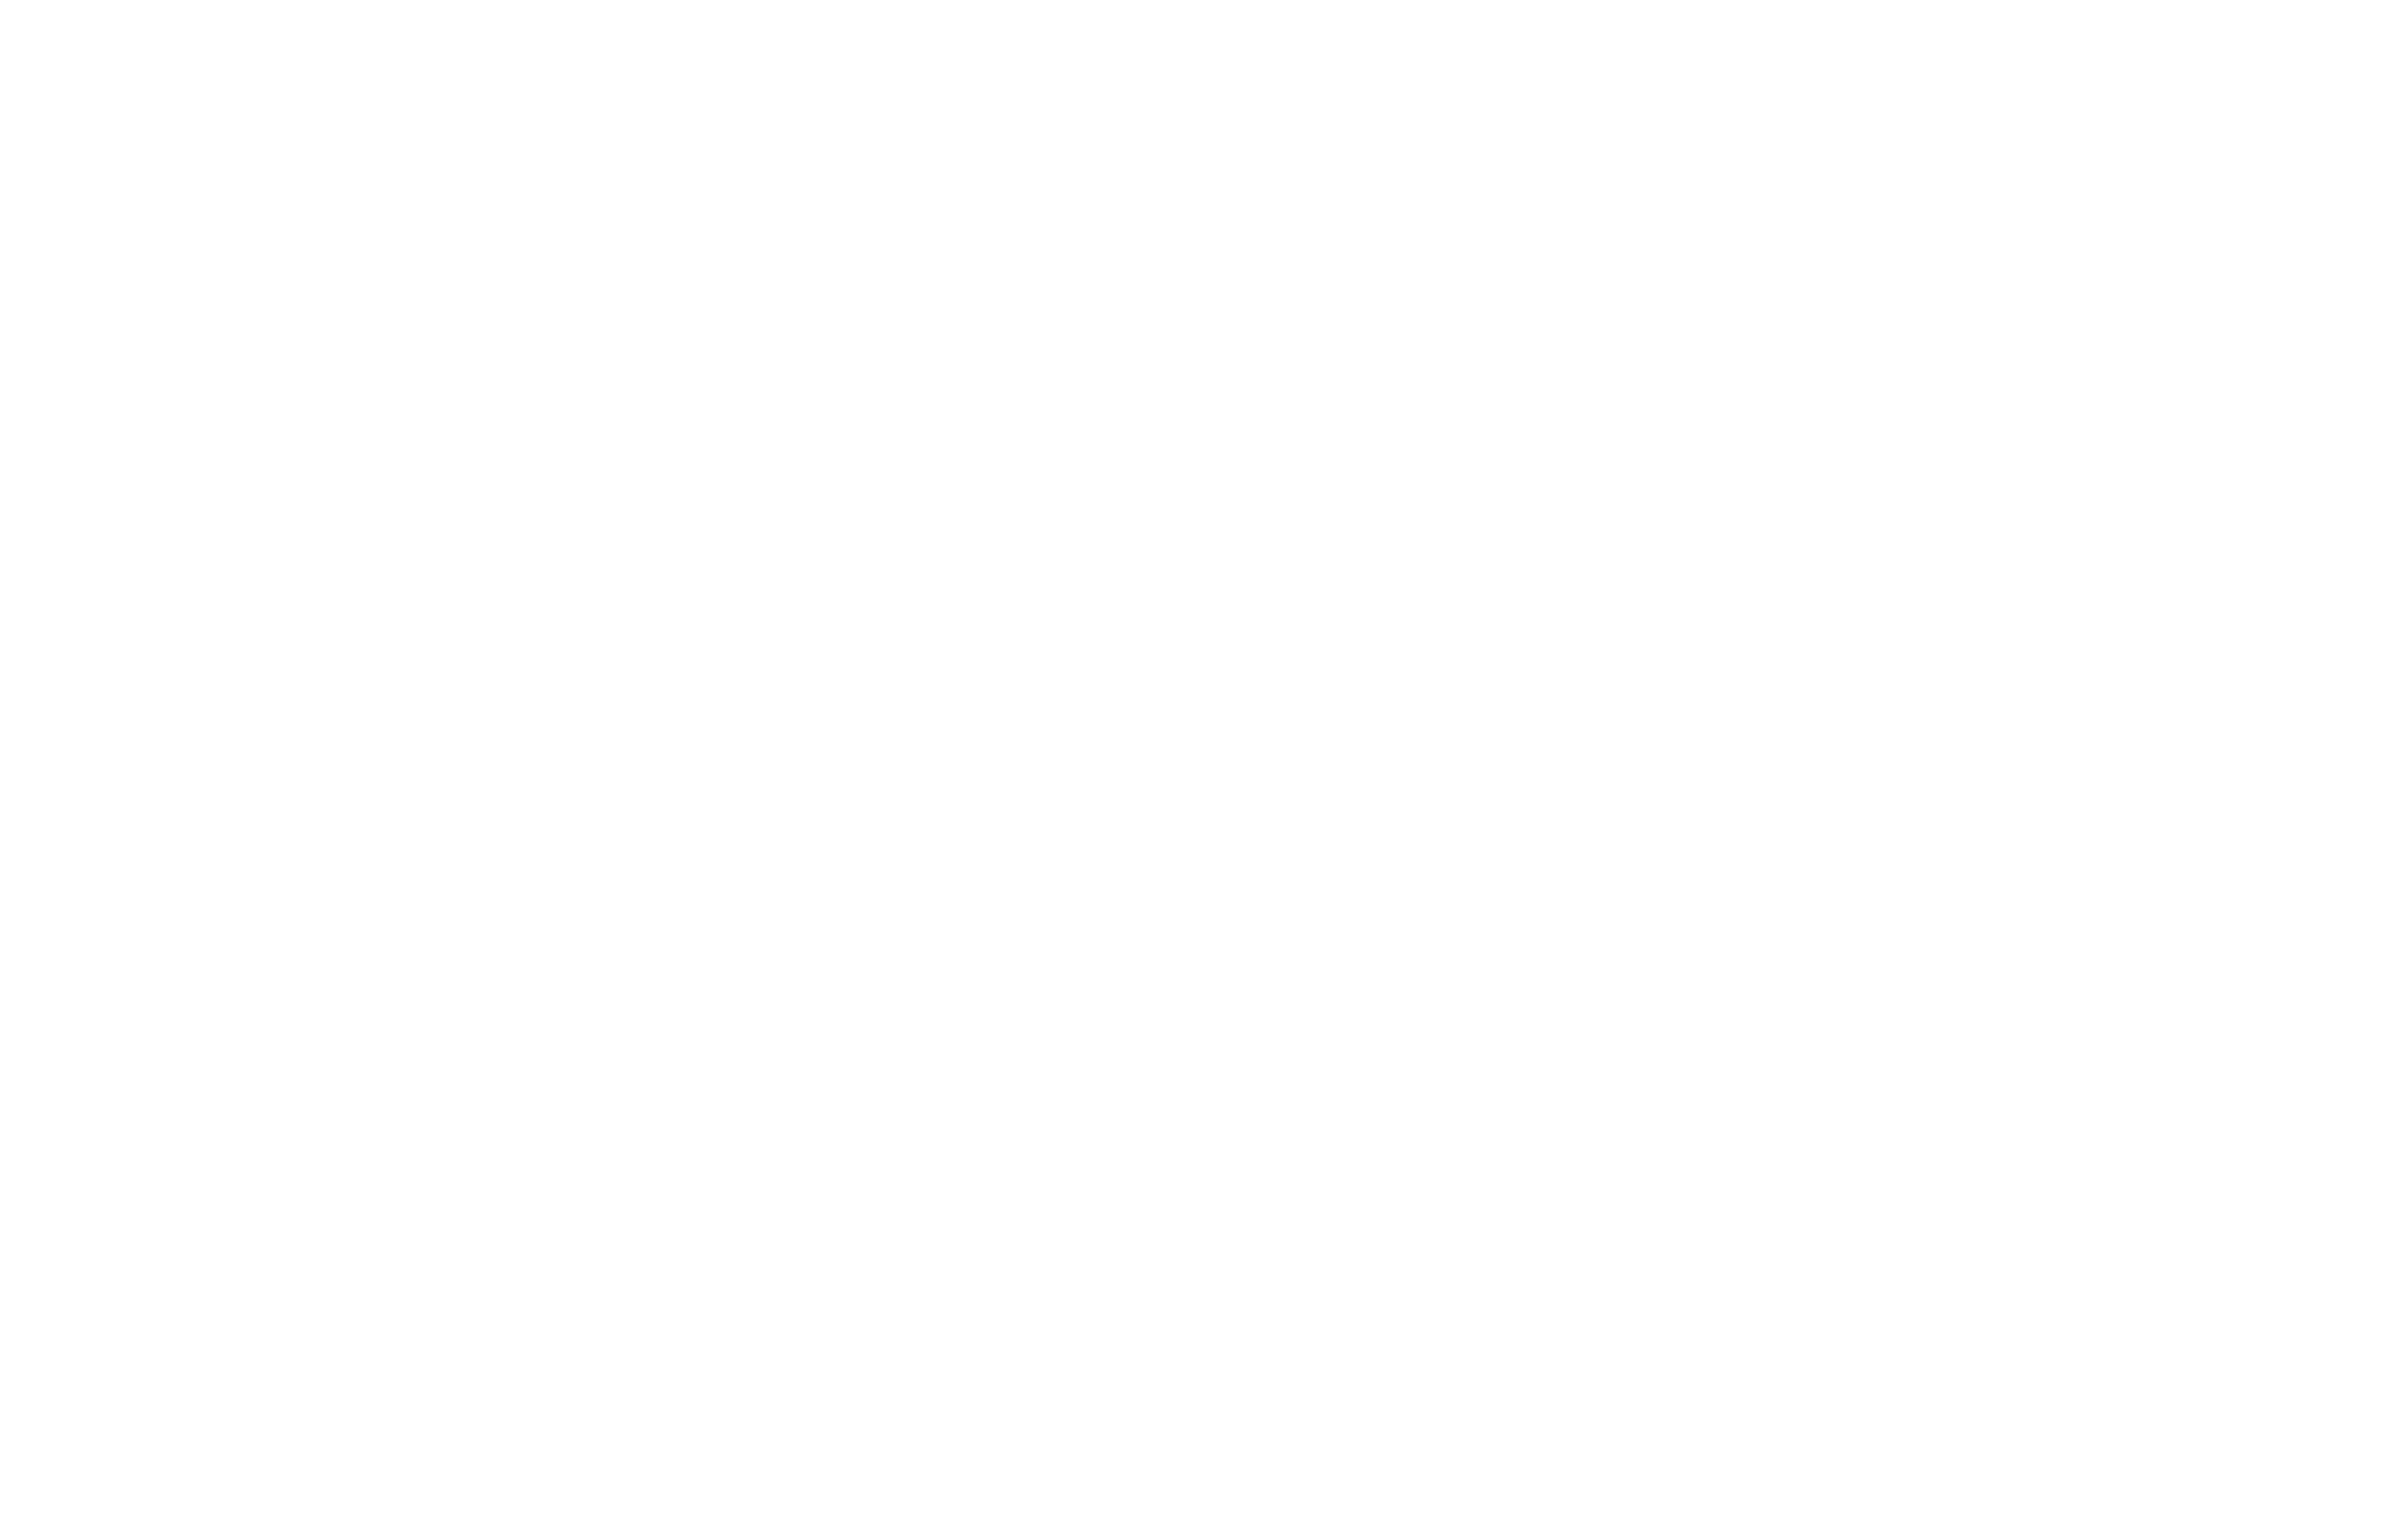 Cargo Trackers: Οδικές Διεθνείς Μεταφορές Σε Ελλάδα & Ευρώπη